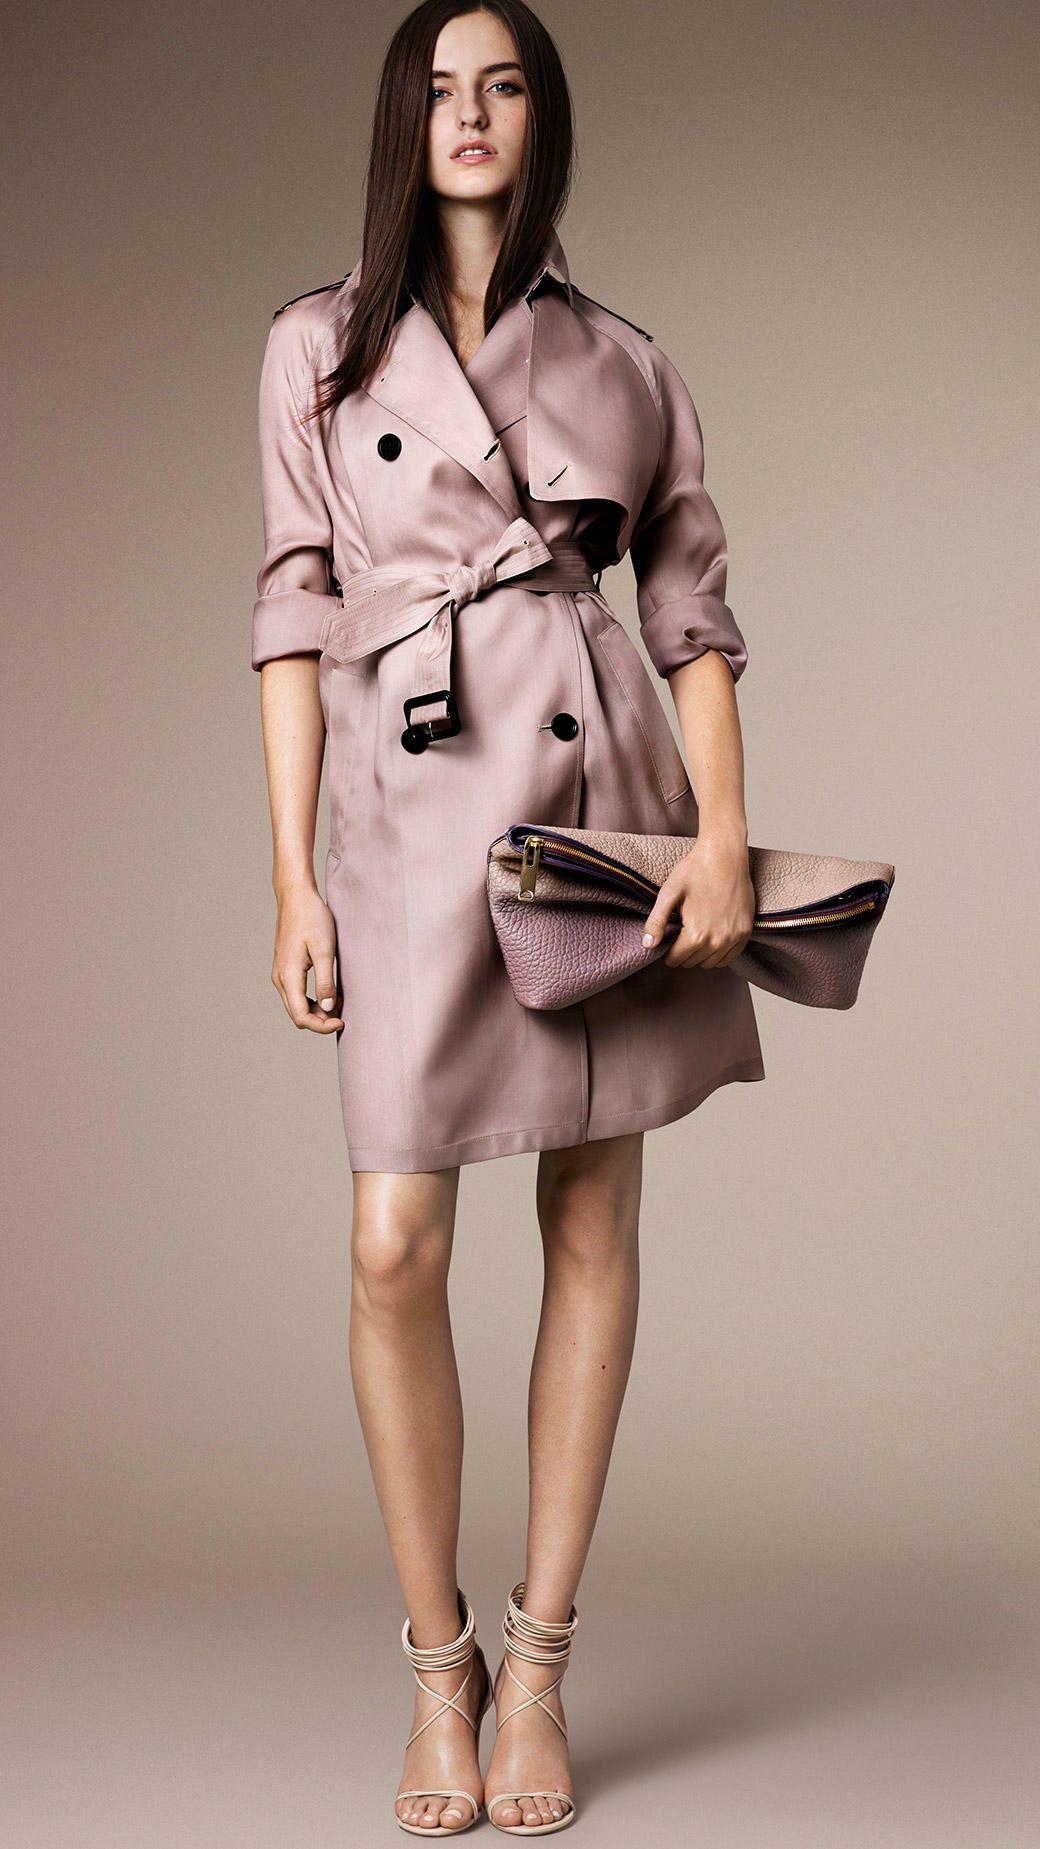 556fdfacf1c Women's Pink Long Oversize Detail Silk Trench Coat | My Personal ...